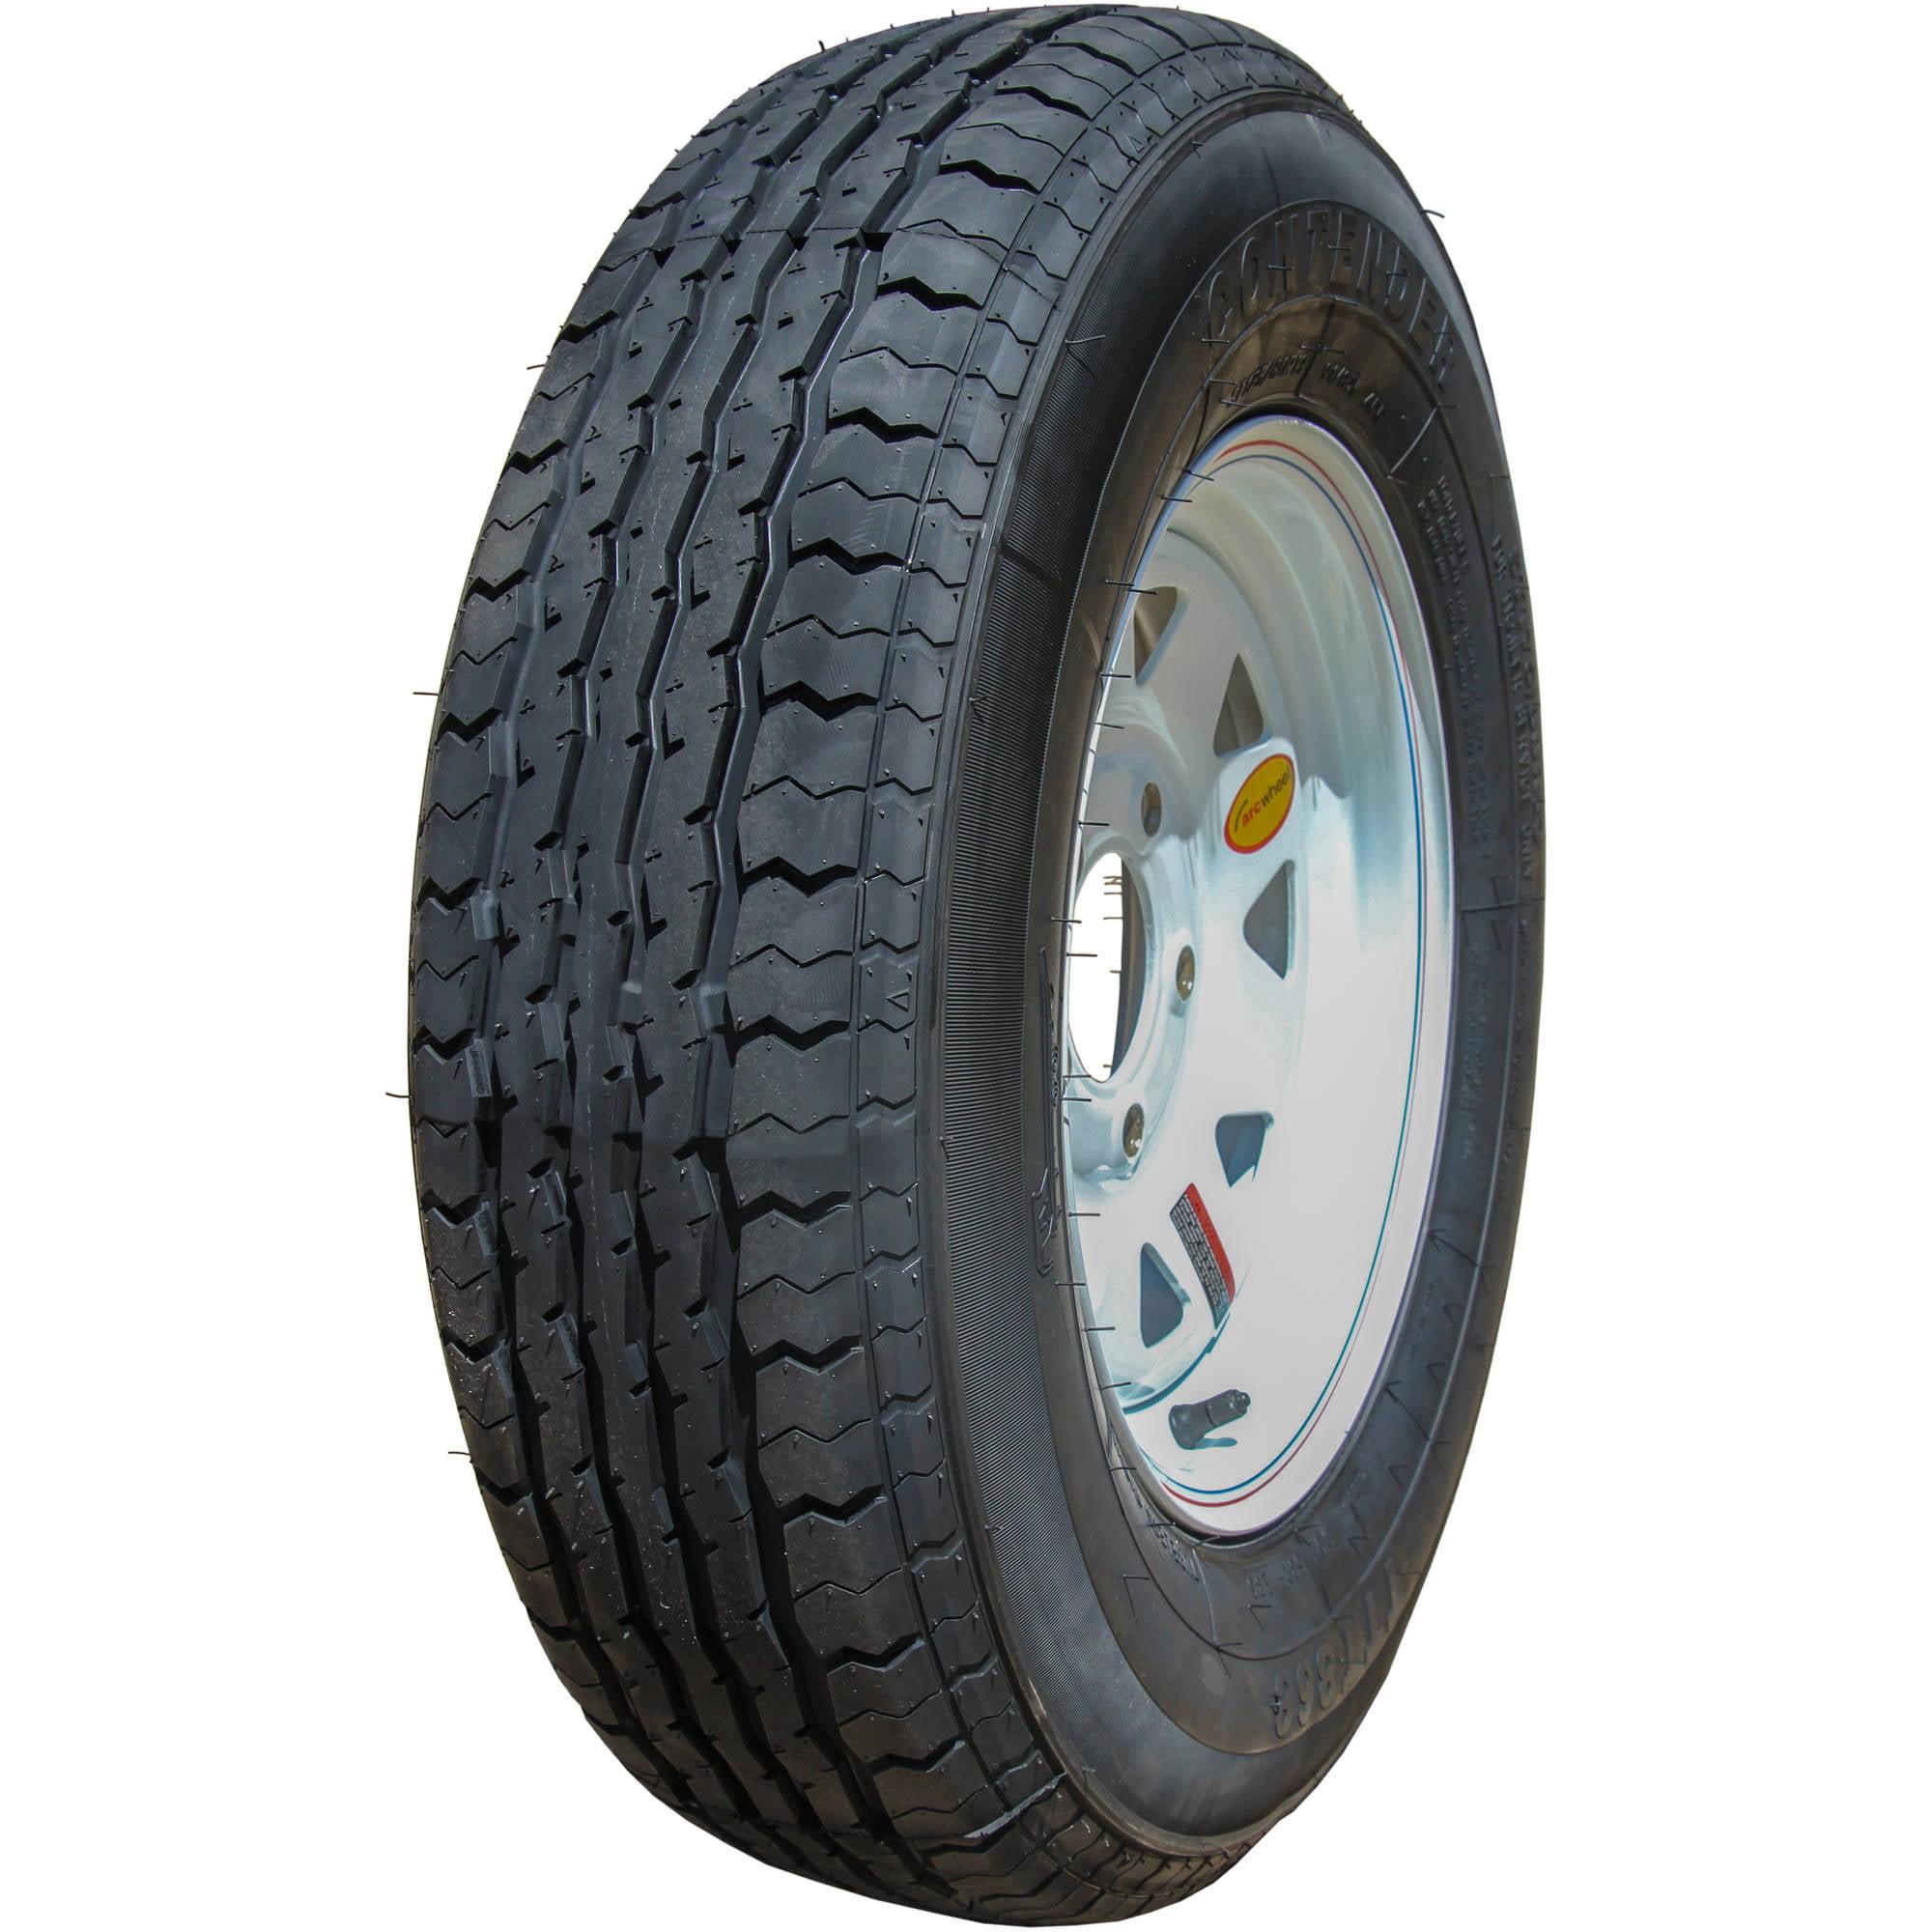 ST175/80R13, Load Range C, Trailer Tire